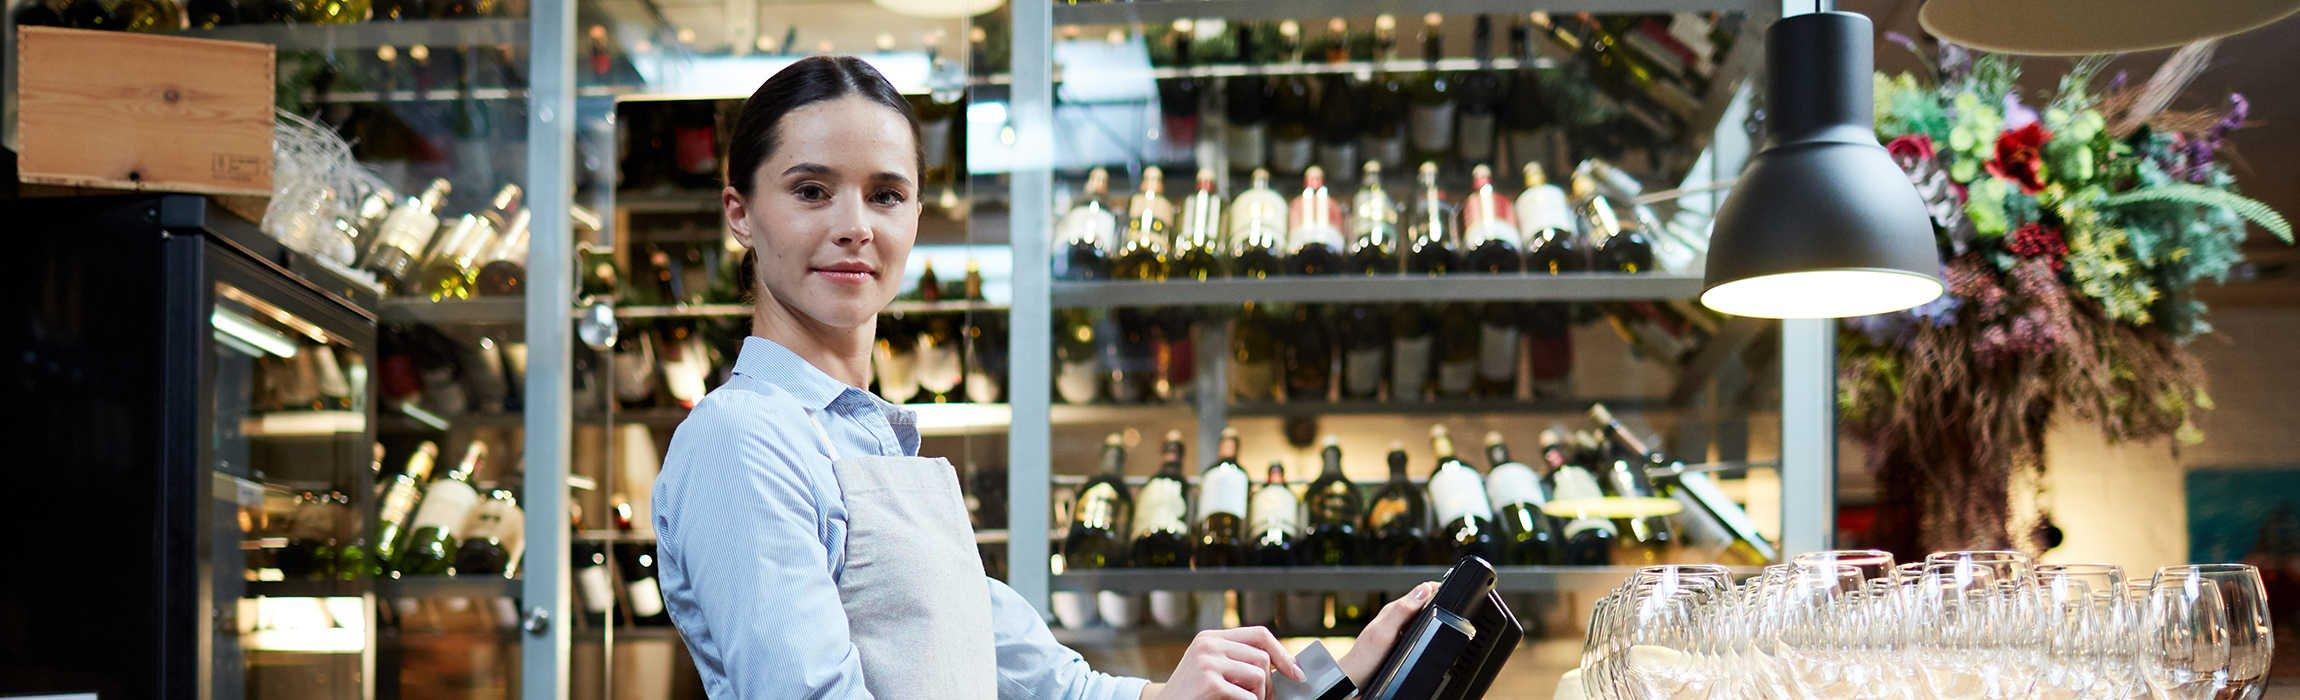 commerçant en vin